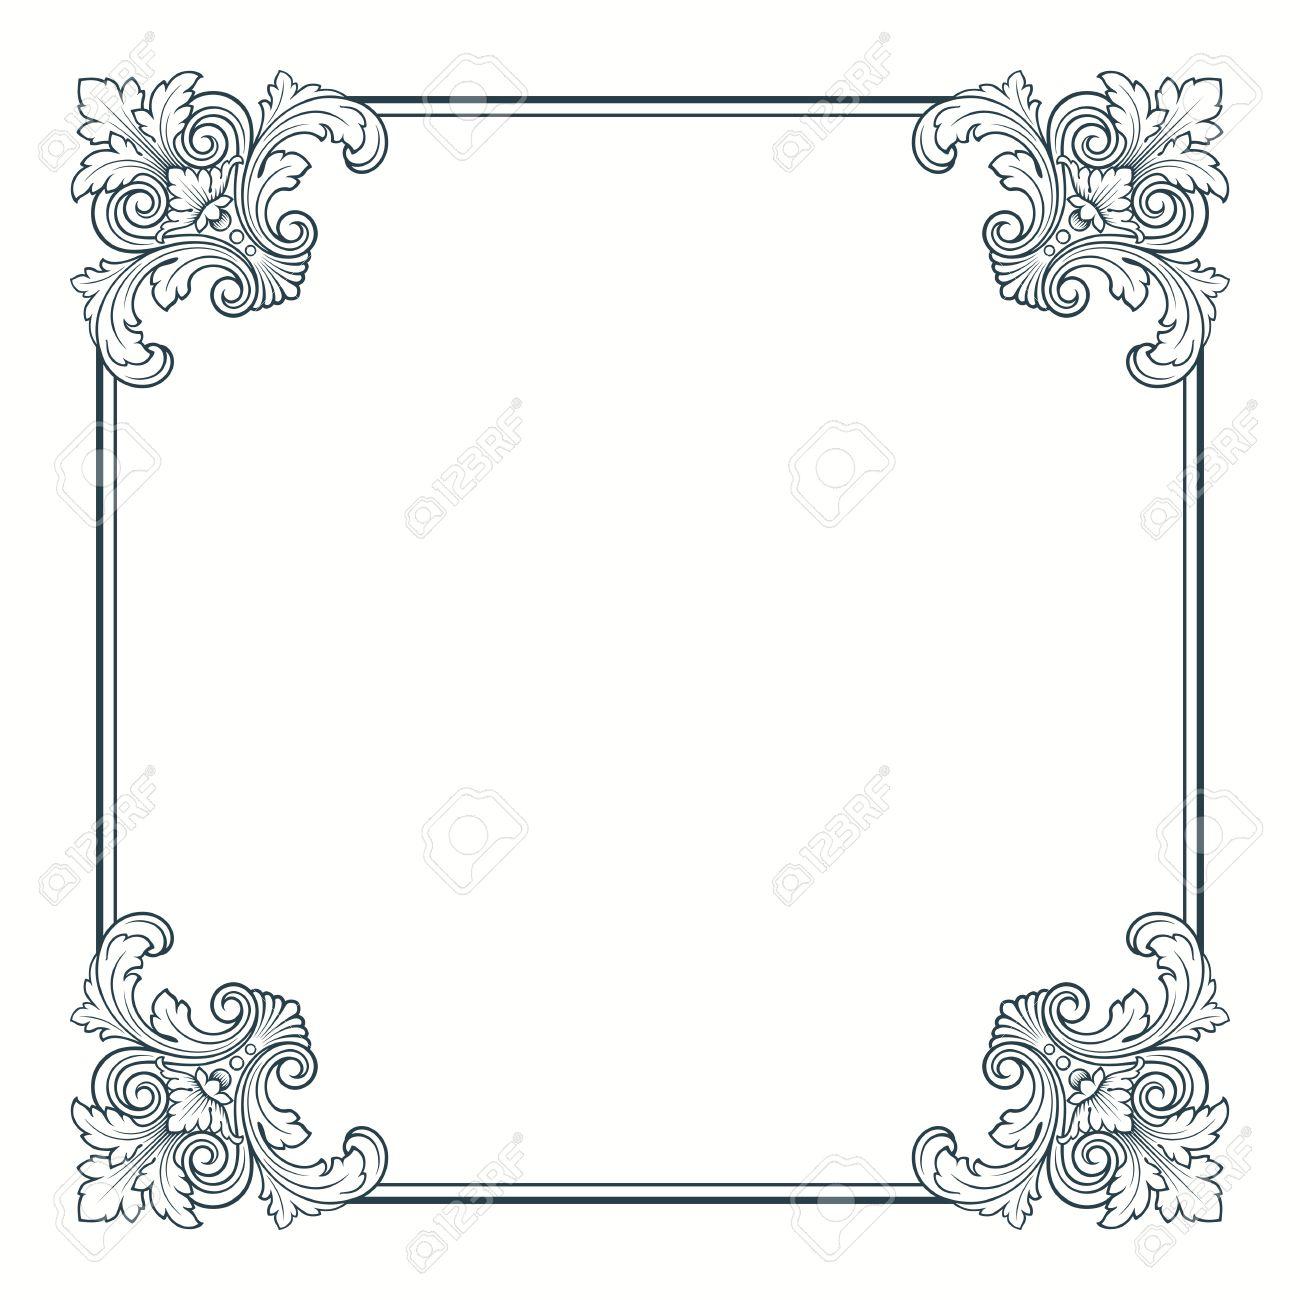 calligraphic ornate vintage frame border decorative design - 13708471